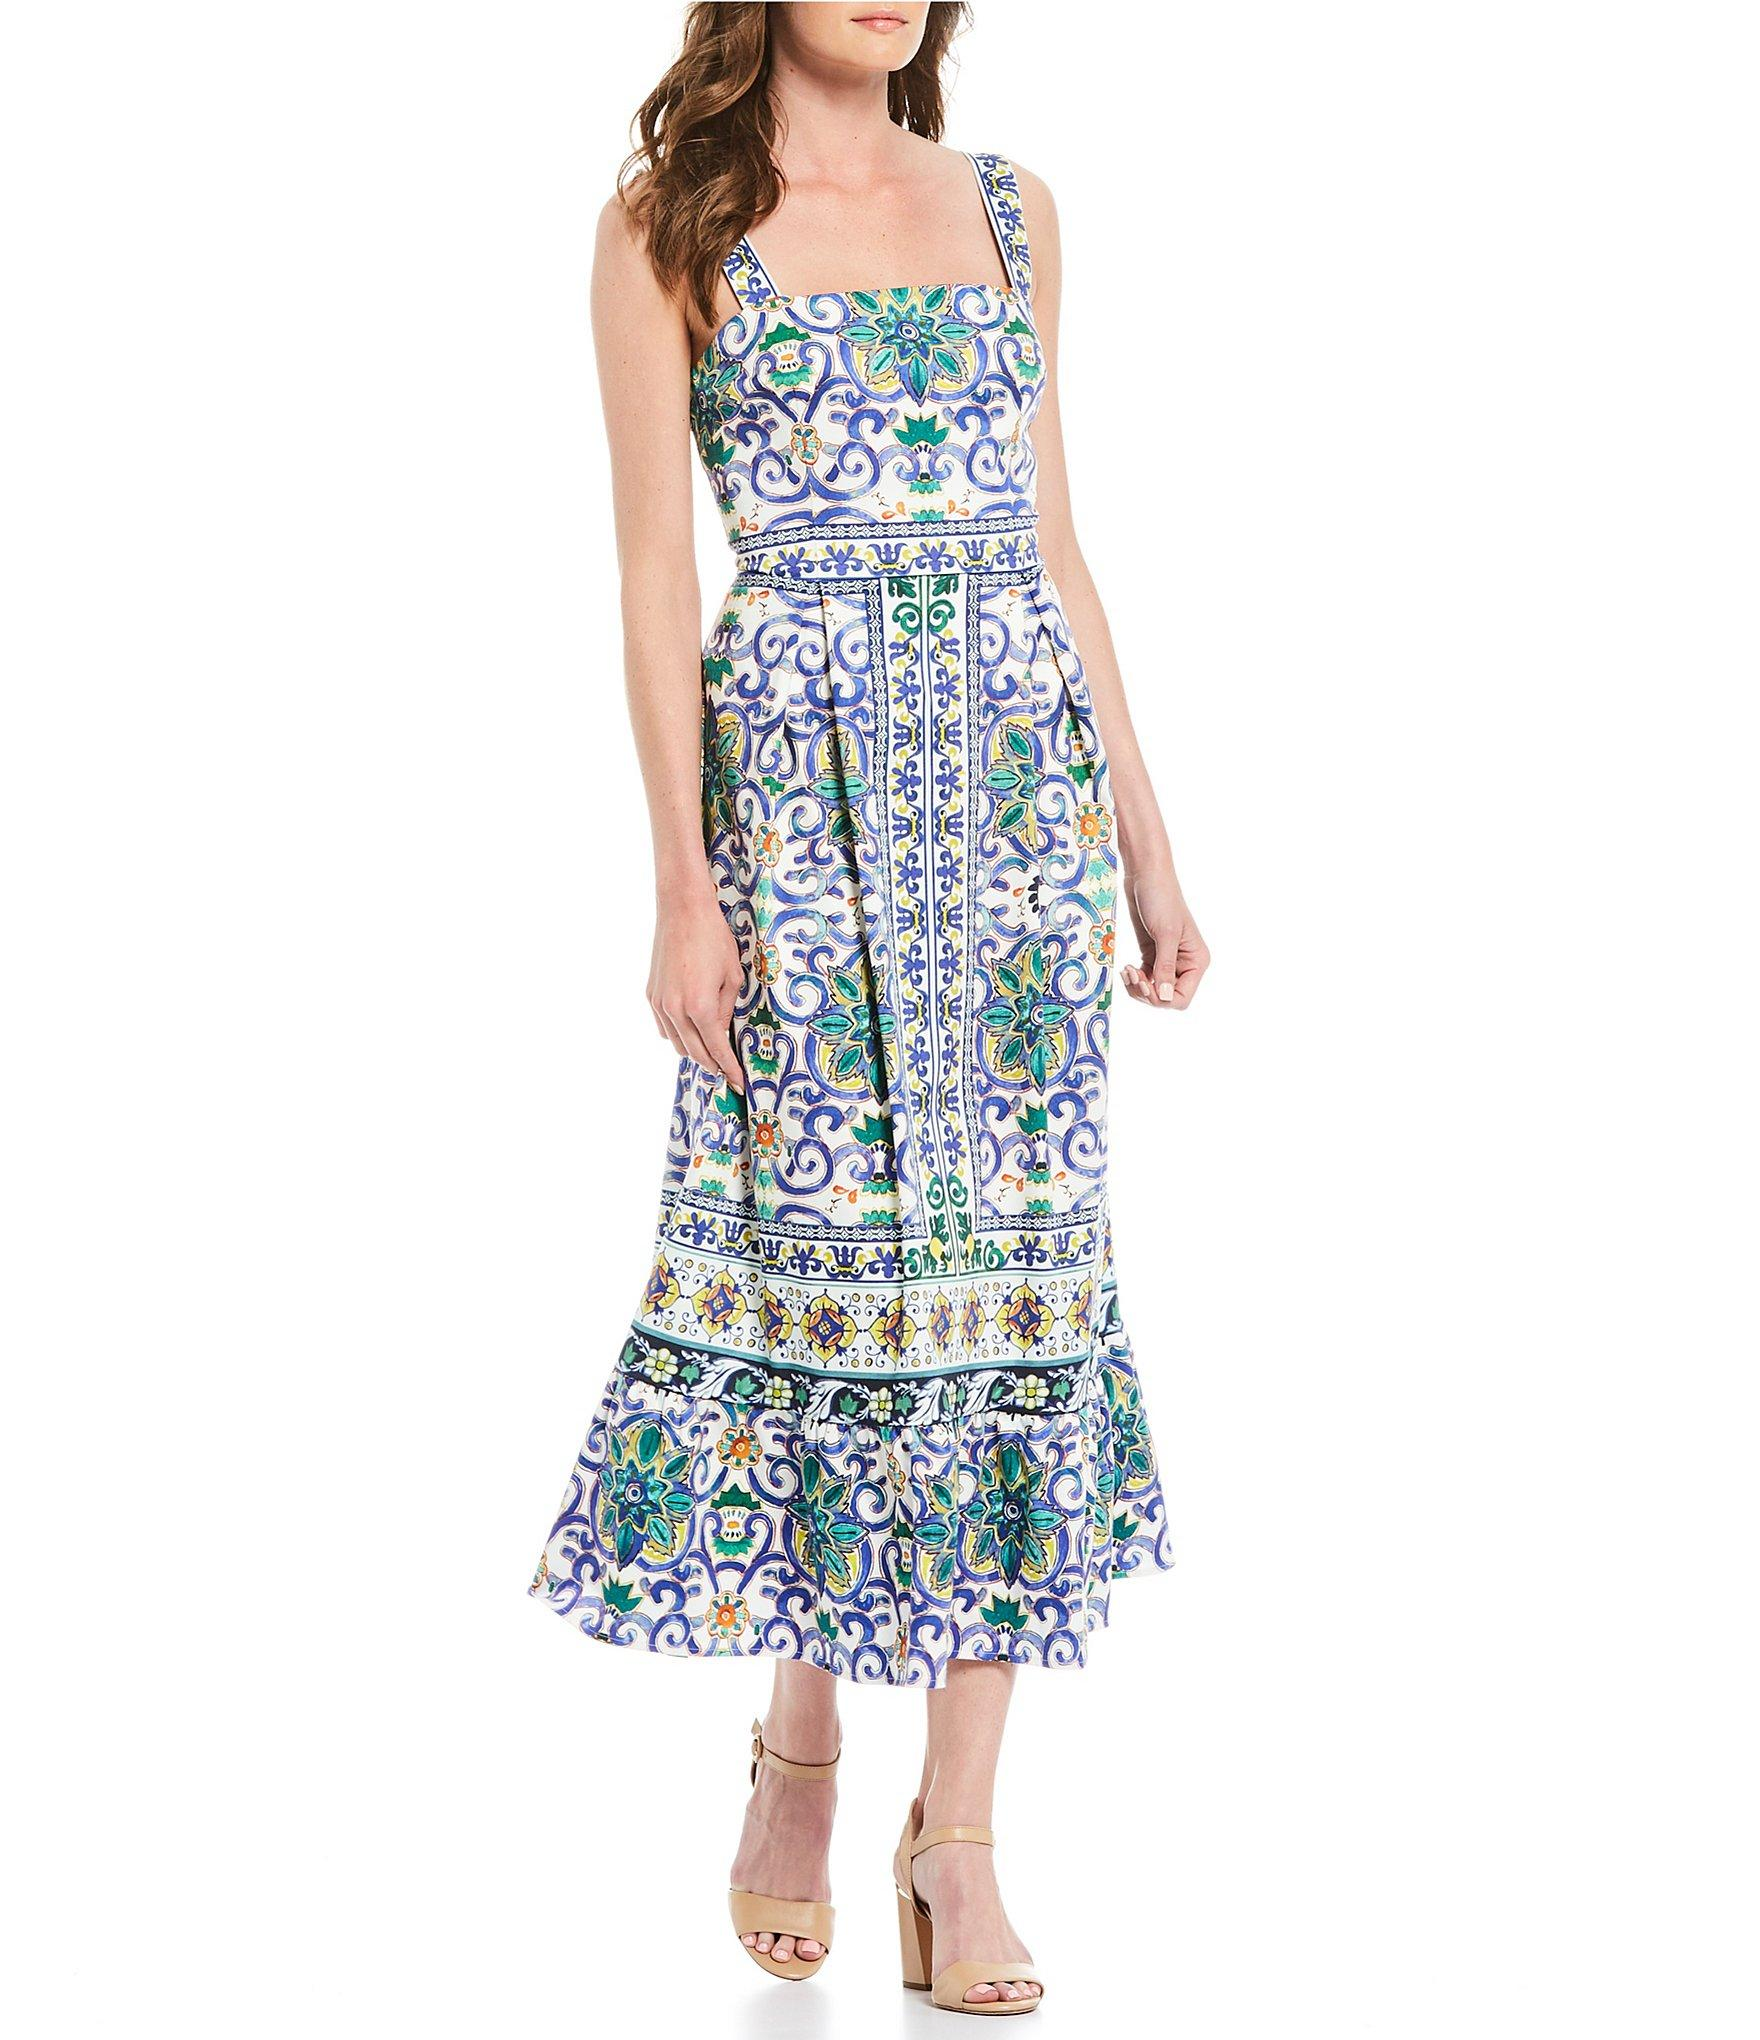 Antonio Melani Women/'s Natural Alexandra Dress Size 2 8 10 New NWT